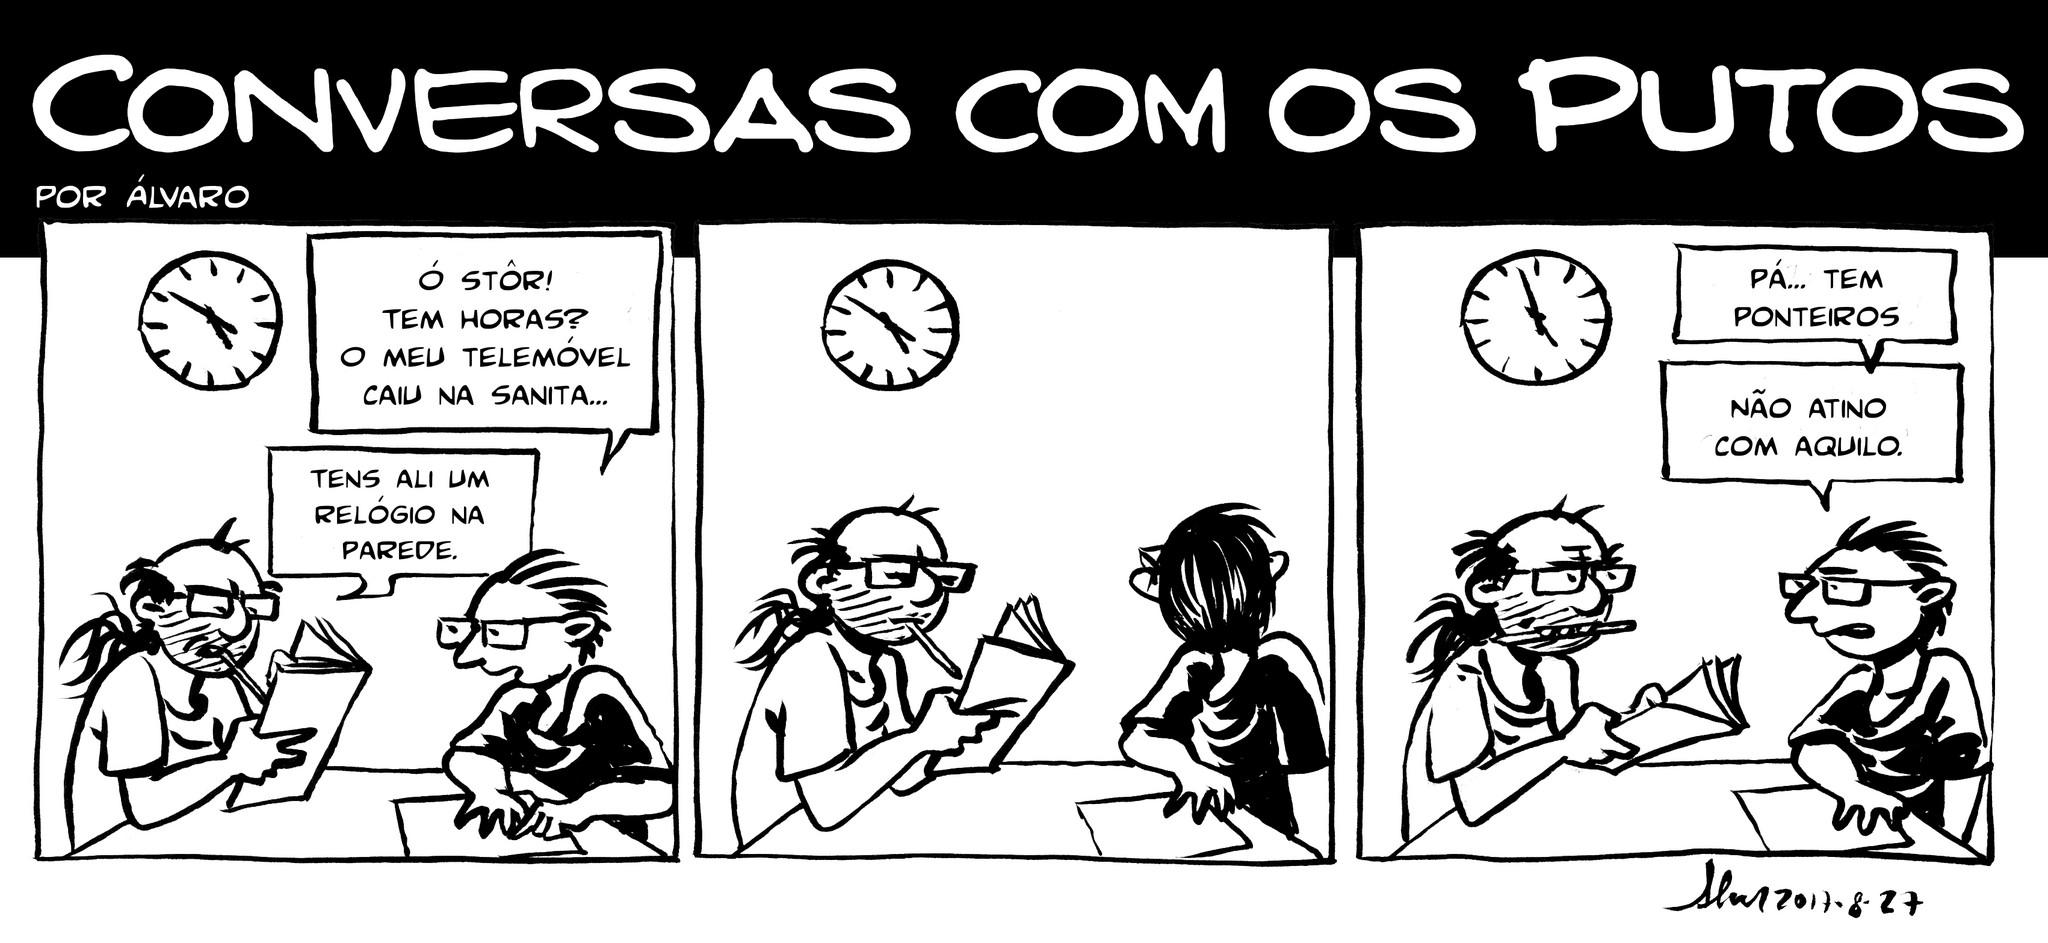 2017-08-27 - ponteiros - net.tif